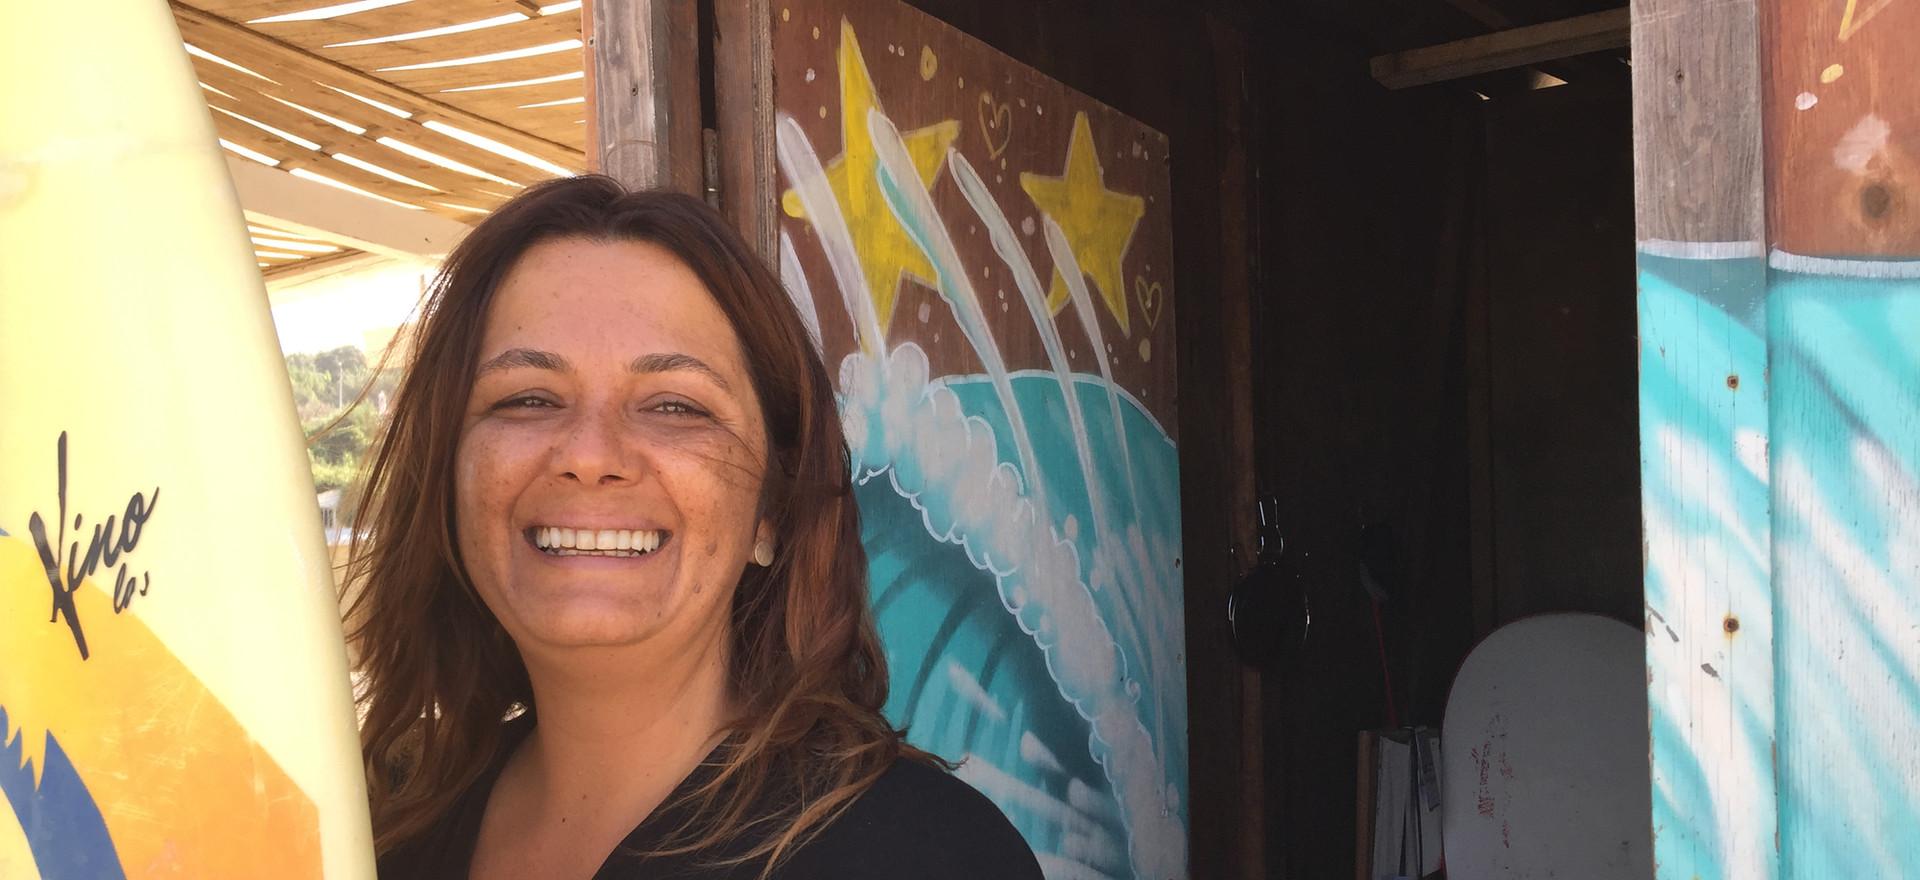 Awake Retreat Surf and Yoga Sintra Portugal